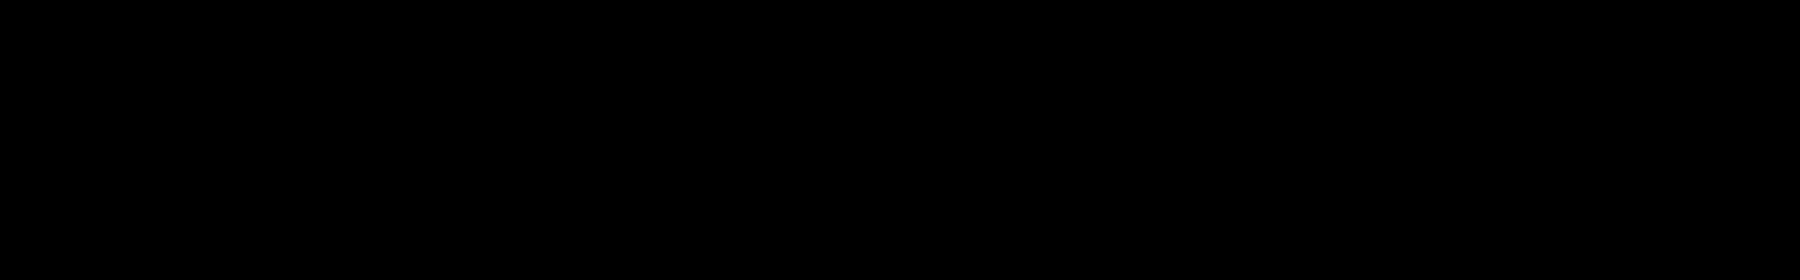 AURA Trance For Sylenth1 audio waveform